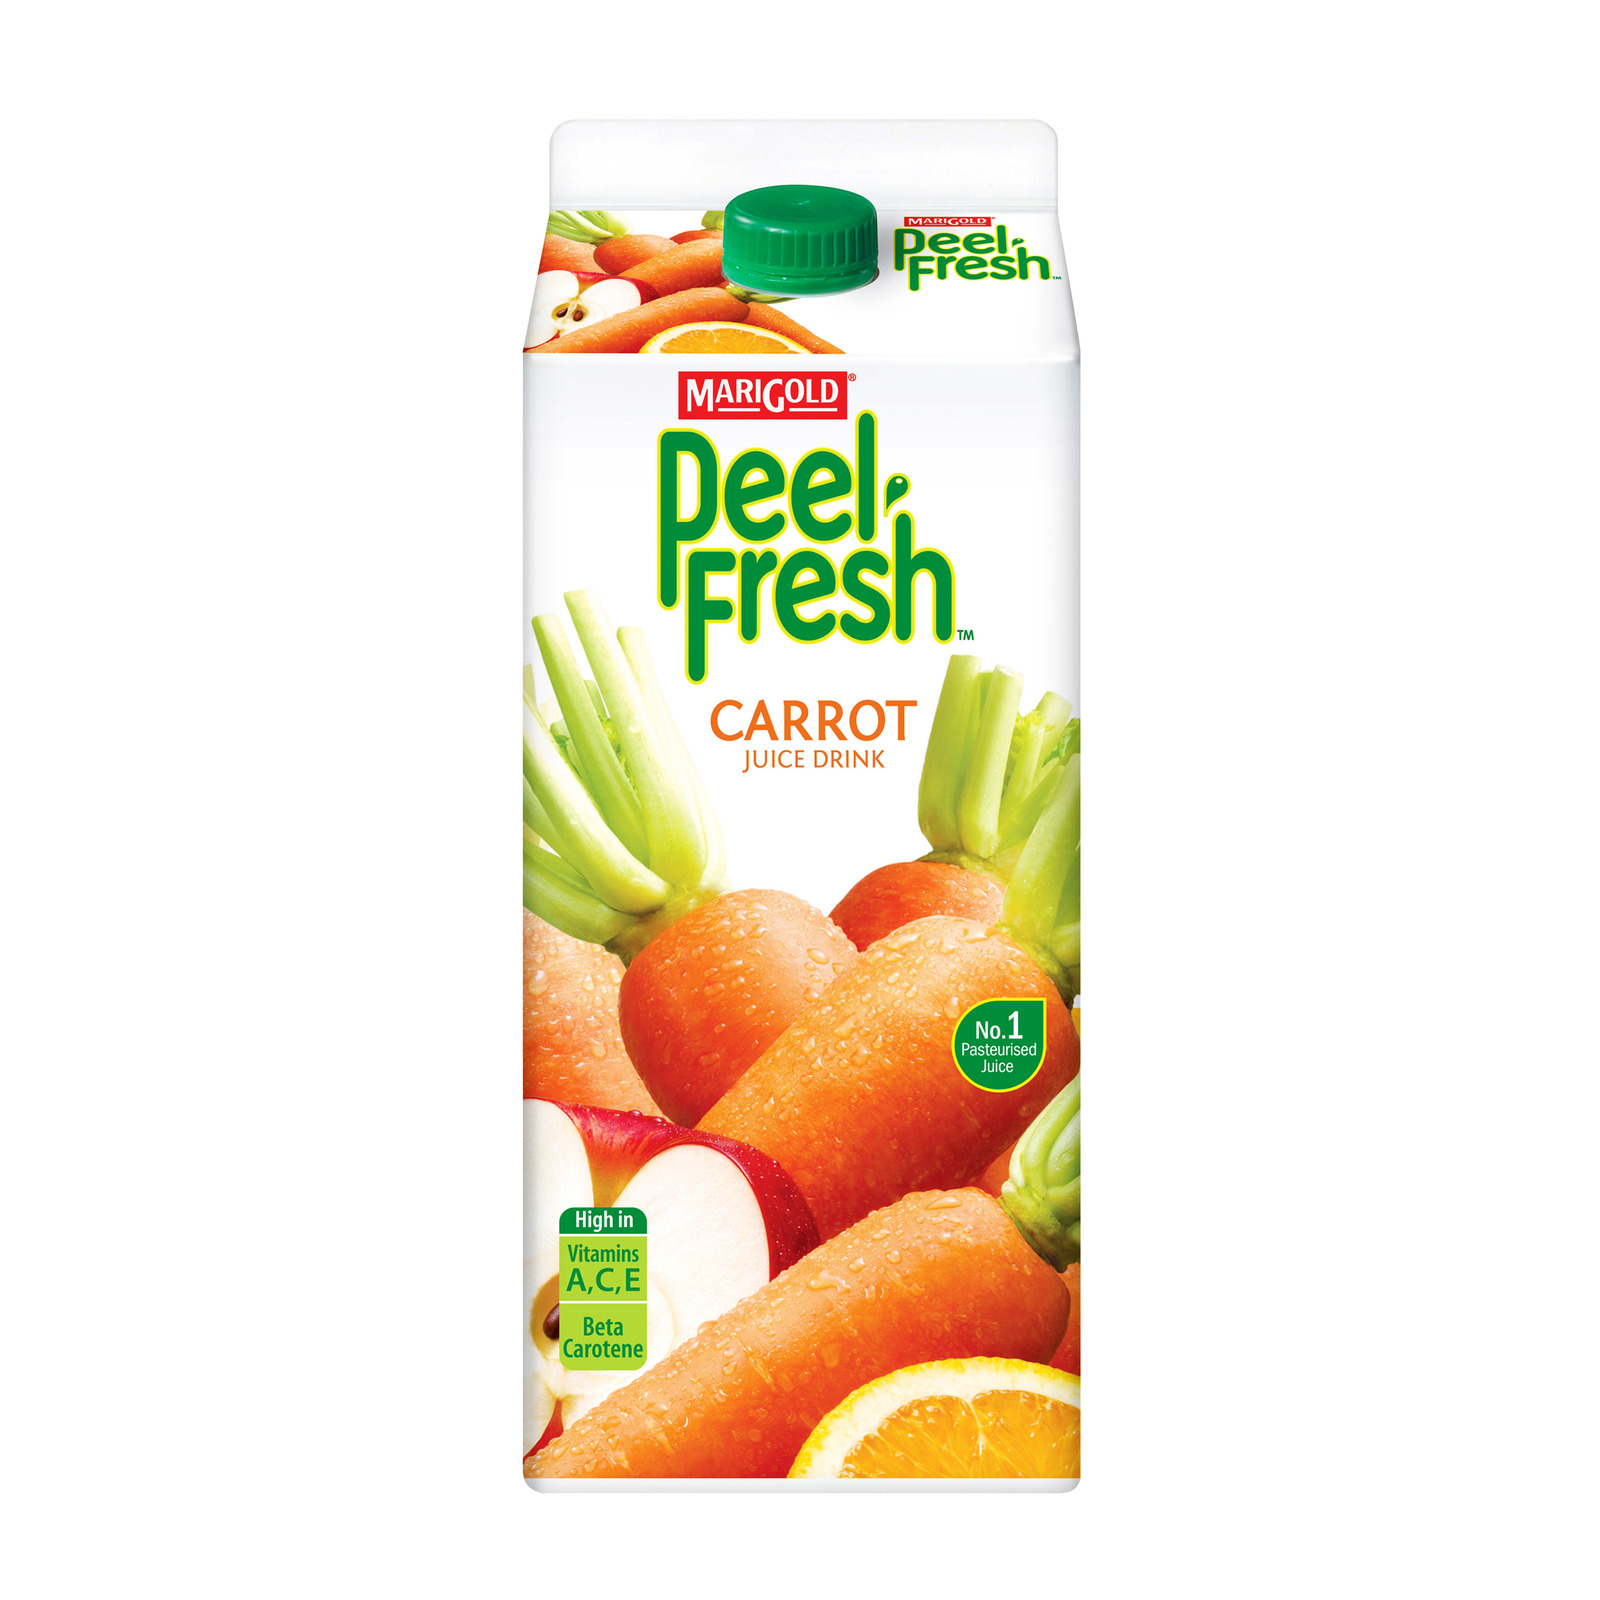 MARIGOLD PEEL FRESH Carrot Juice 1.89L